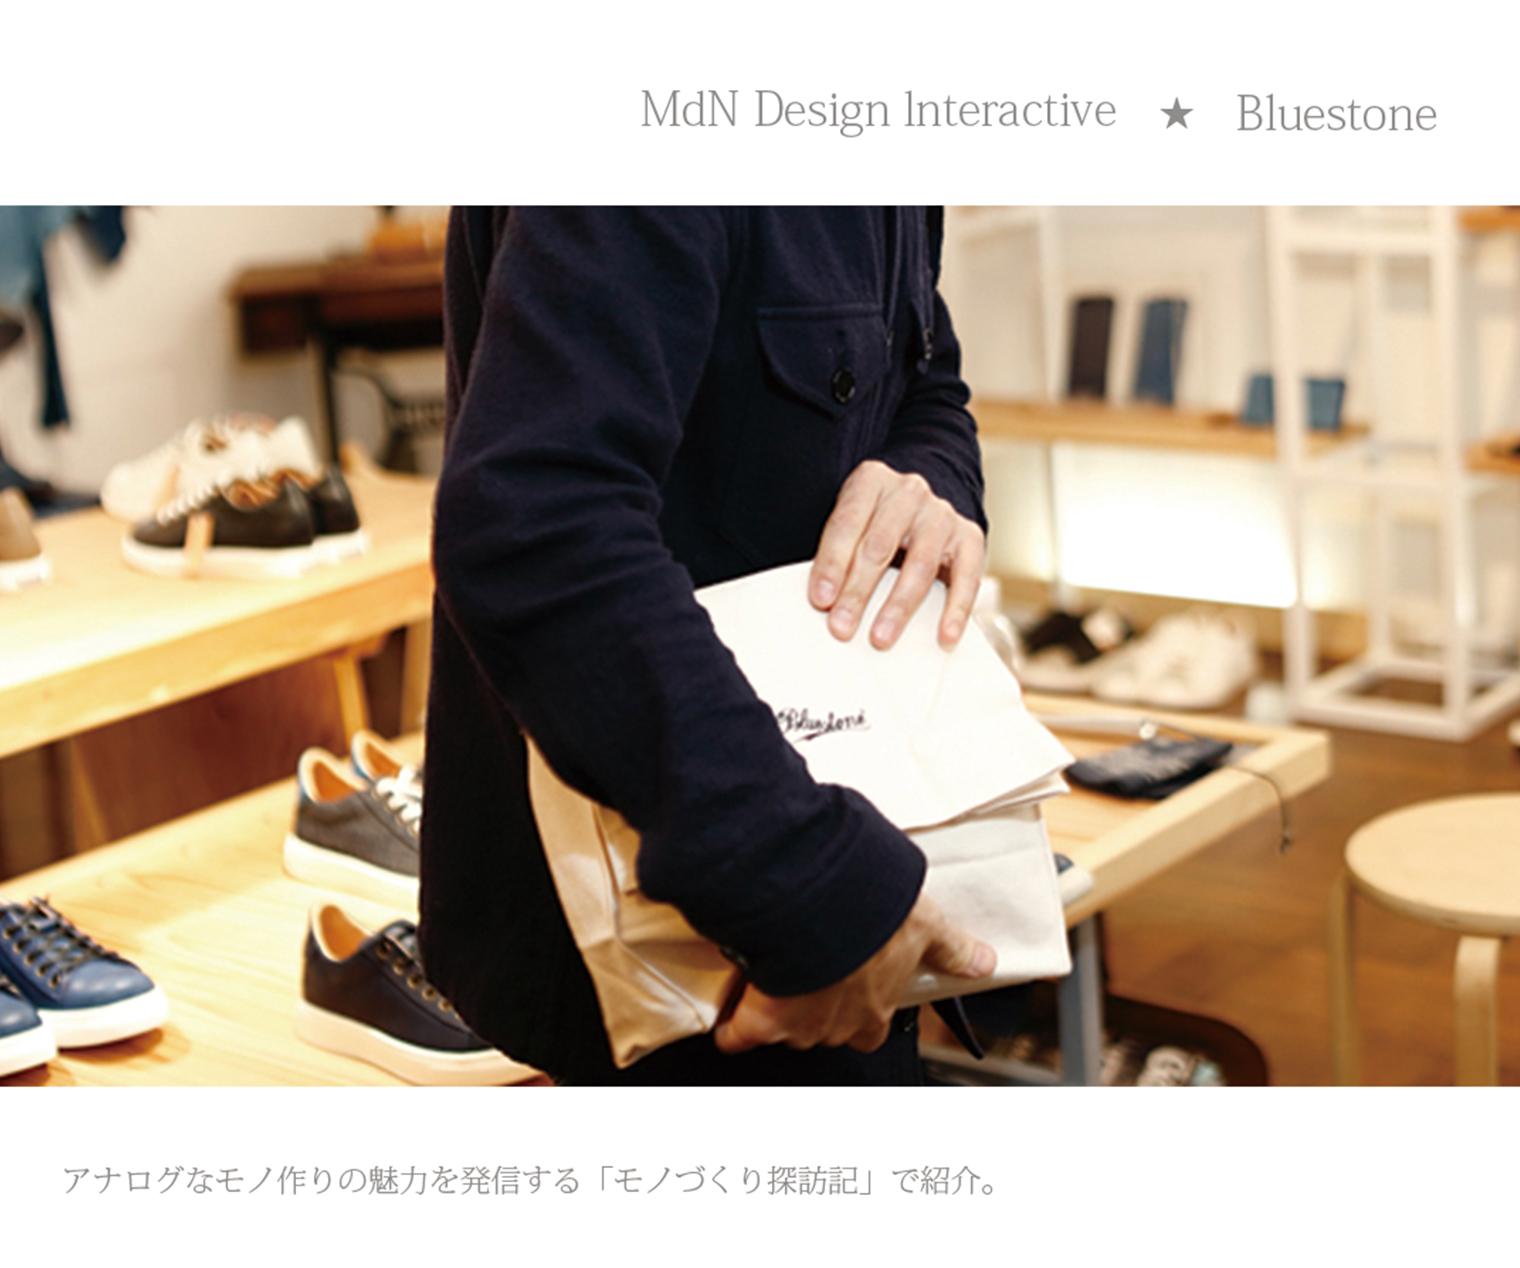 MdN Design Interactive 記事掲載のお知らせ